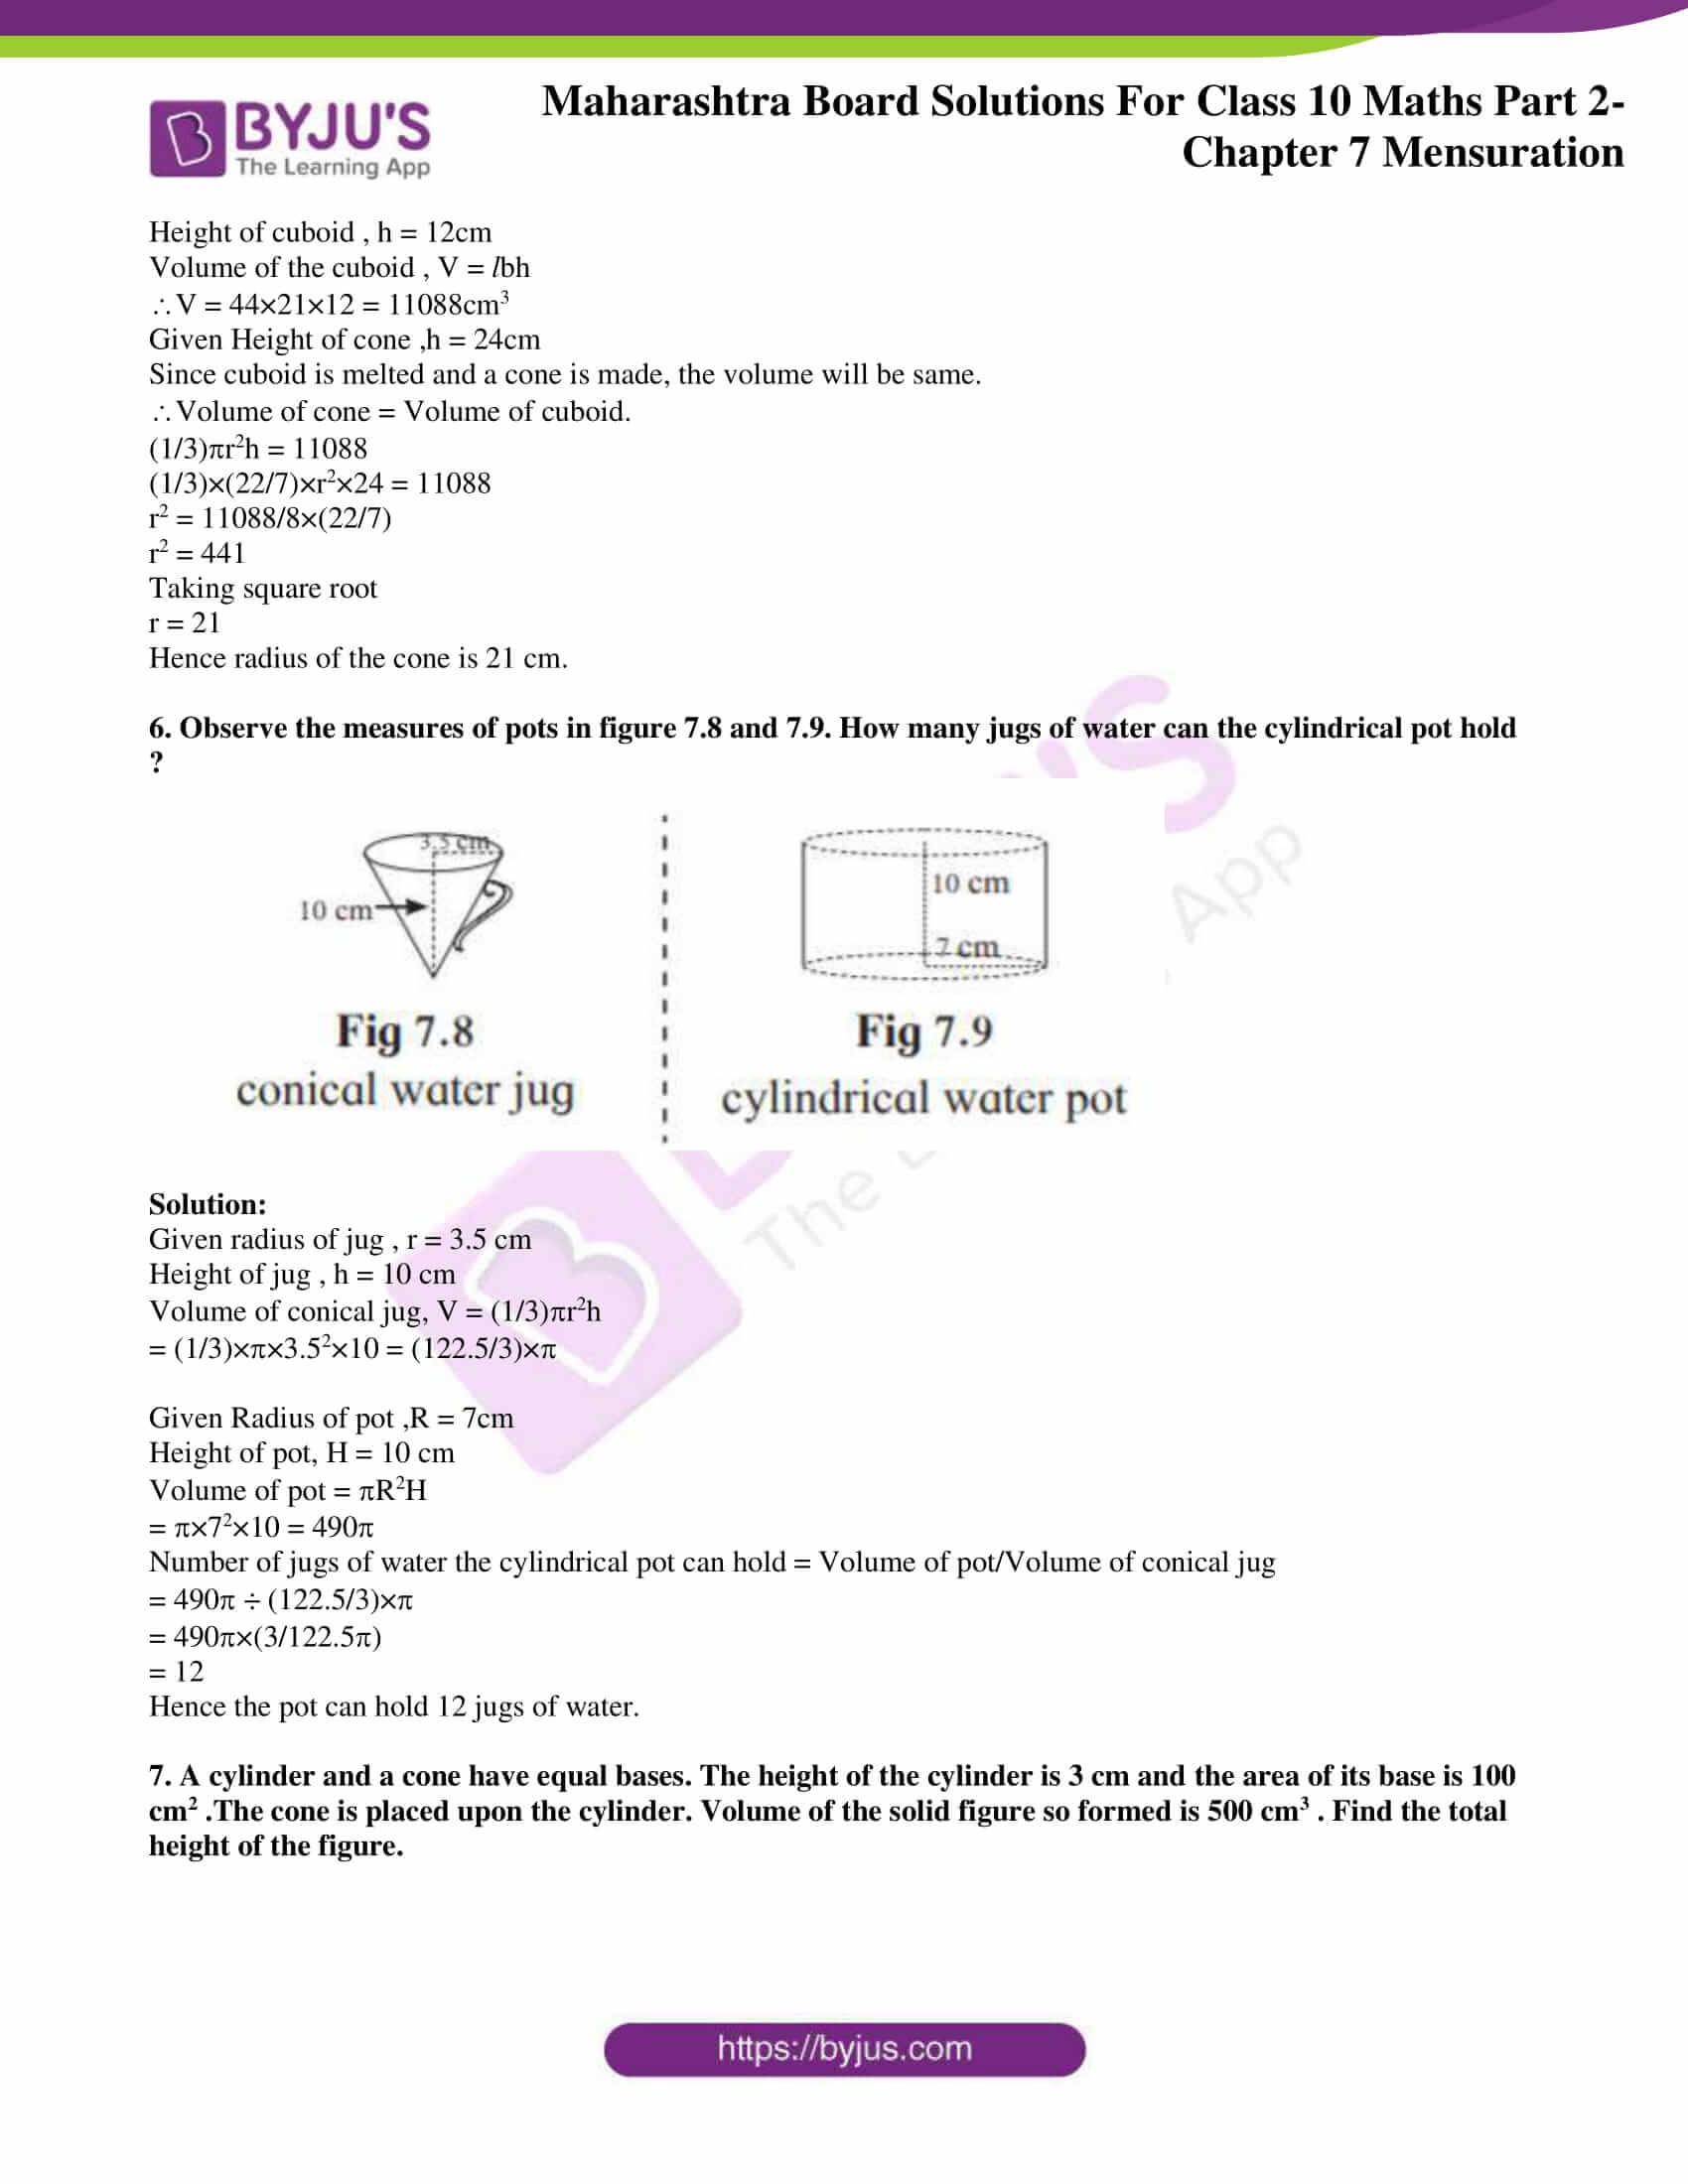 msbshse sol class 10 maths part 2 chapter 7 02